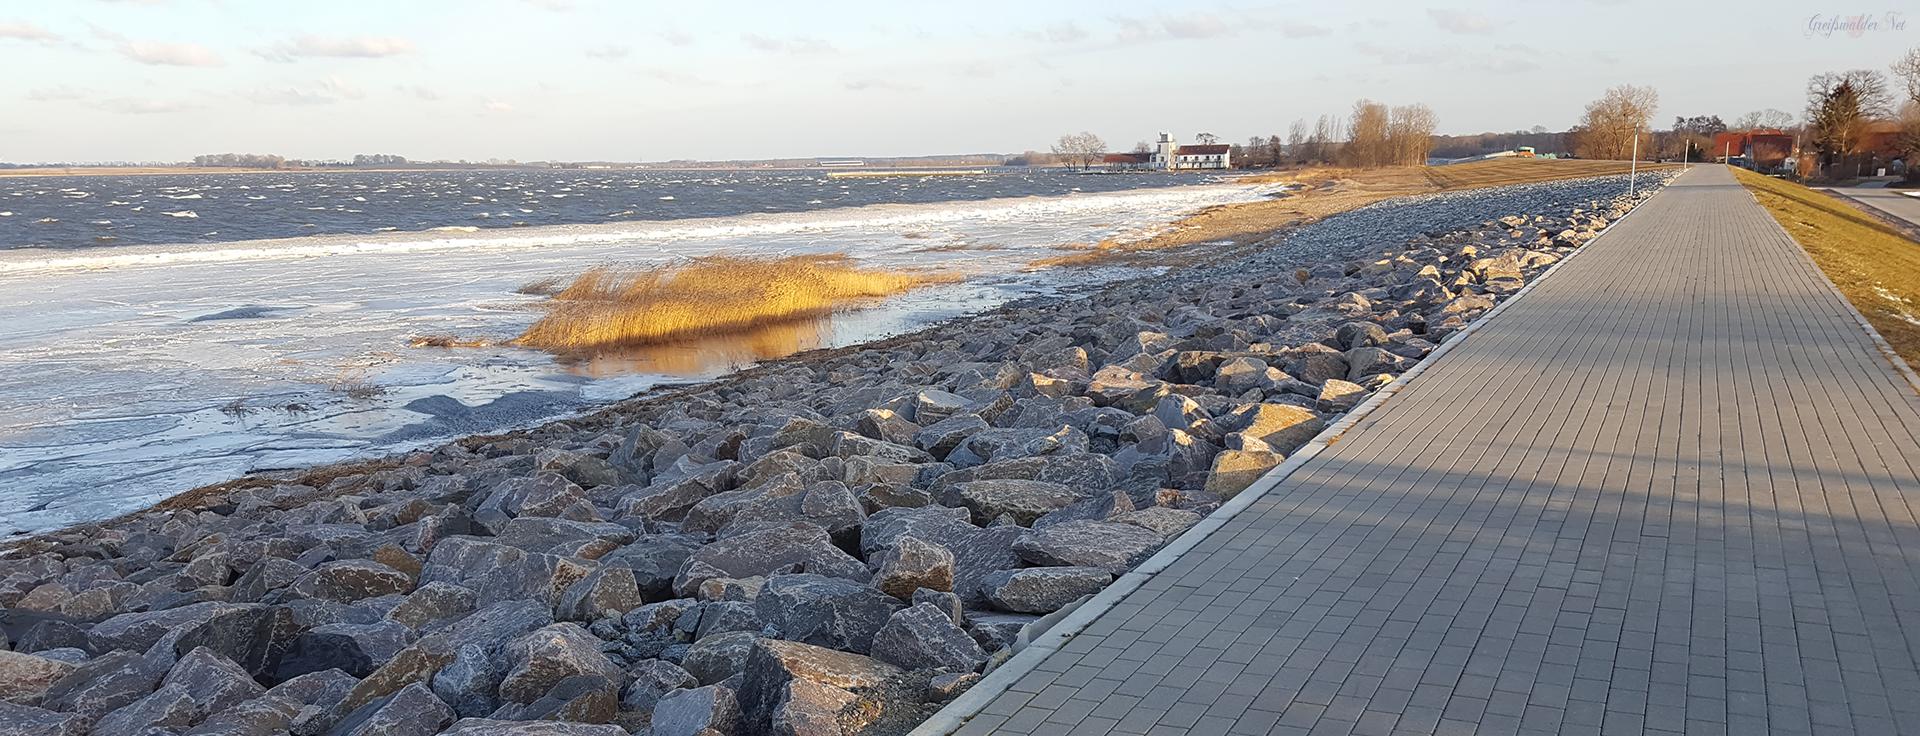 Greifswald-Wieck vereist